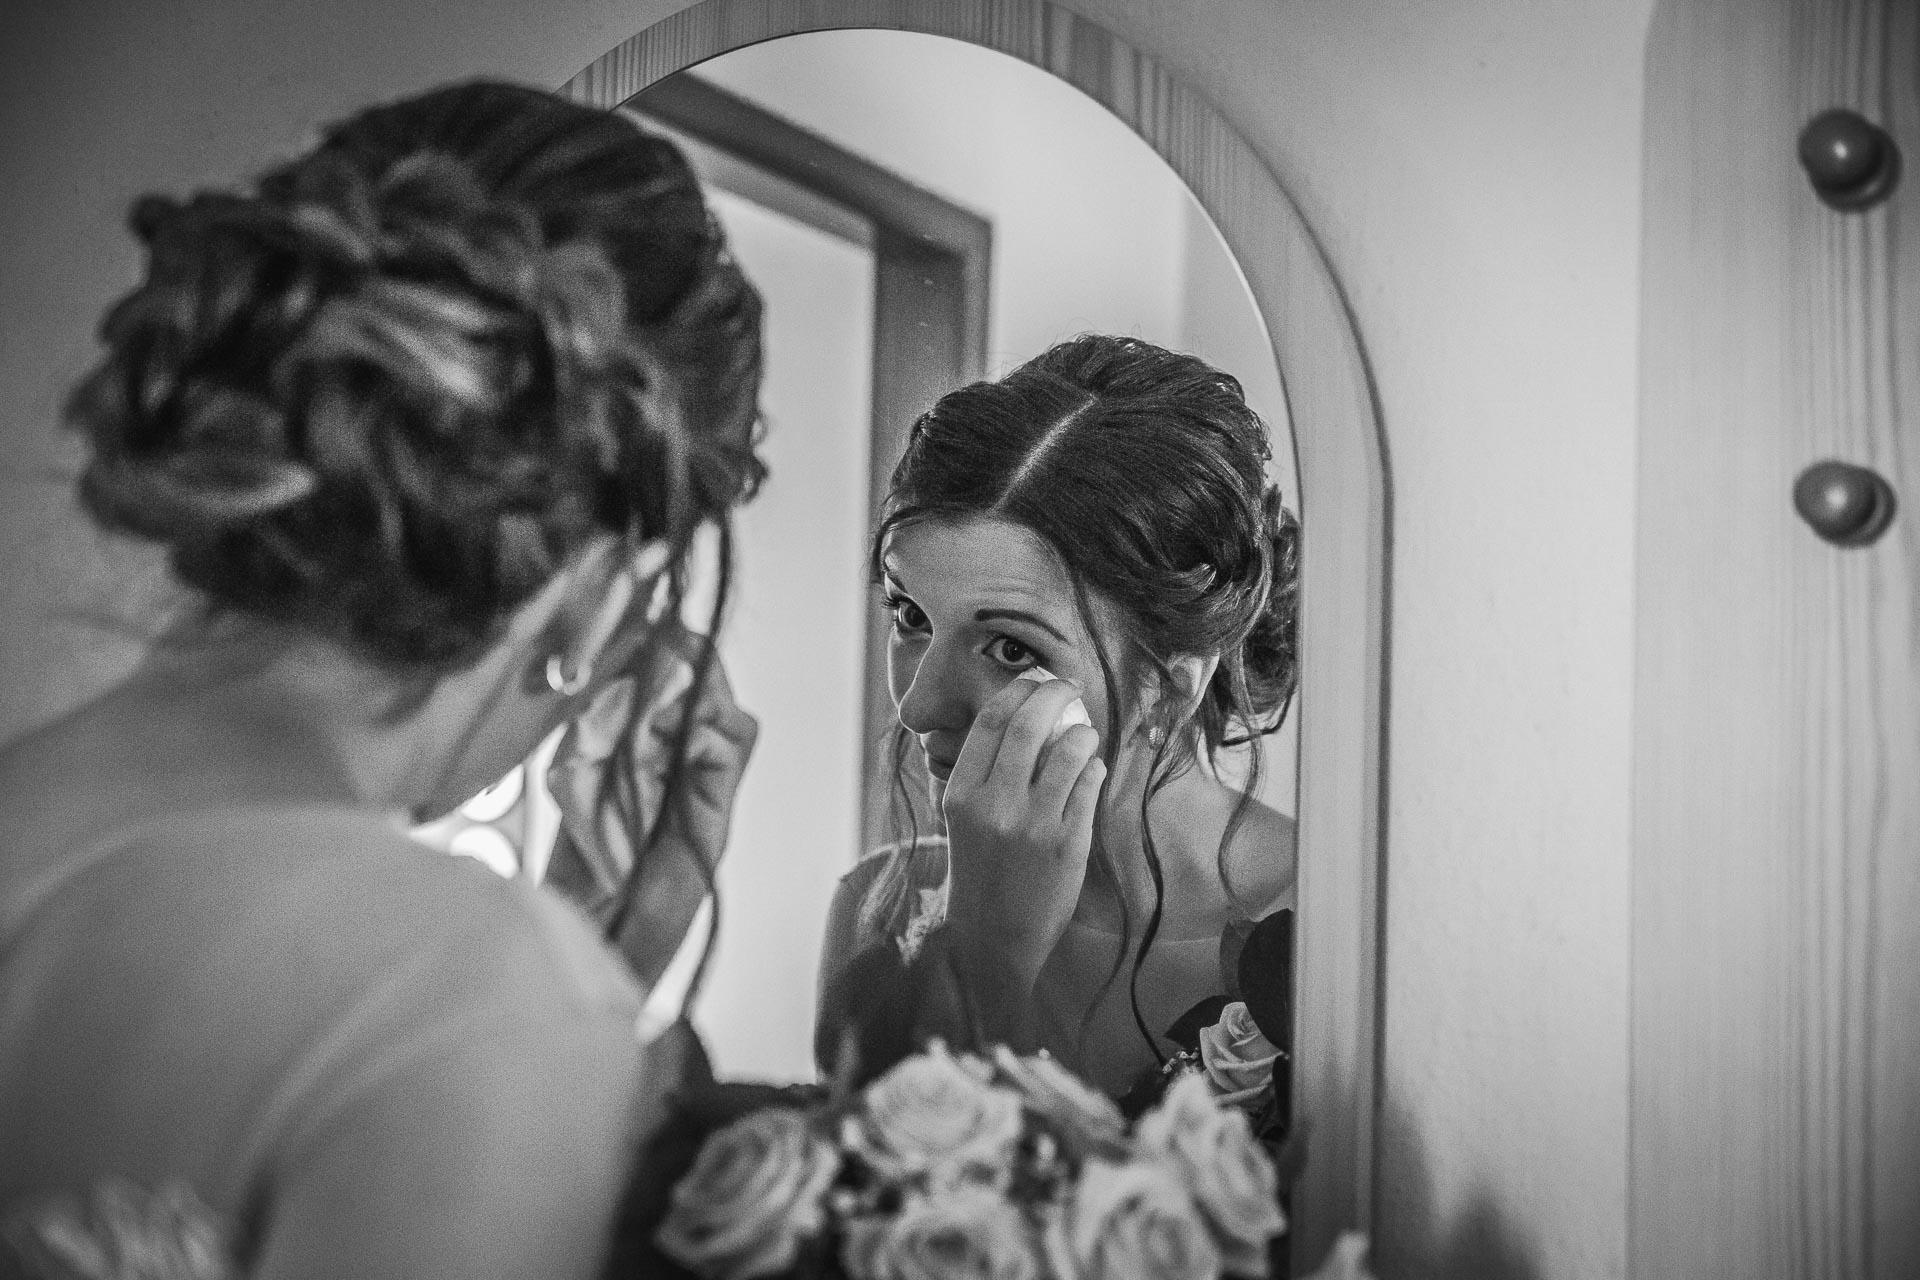 svatební-fotograf-wedding-svatebni-video-orlík-vltava-kostel-statek-stodola-boho-svatba-Beautyfoto-163